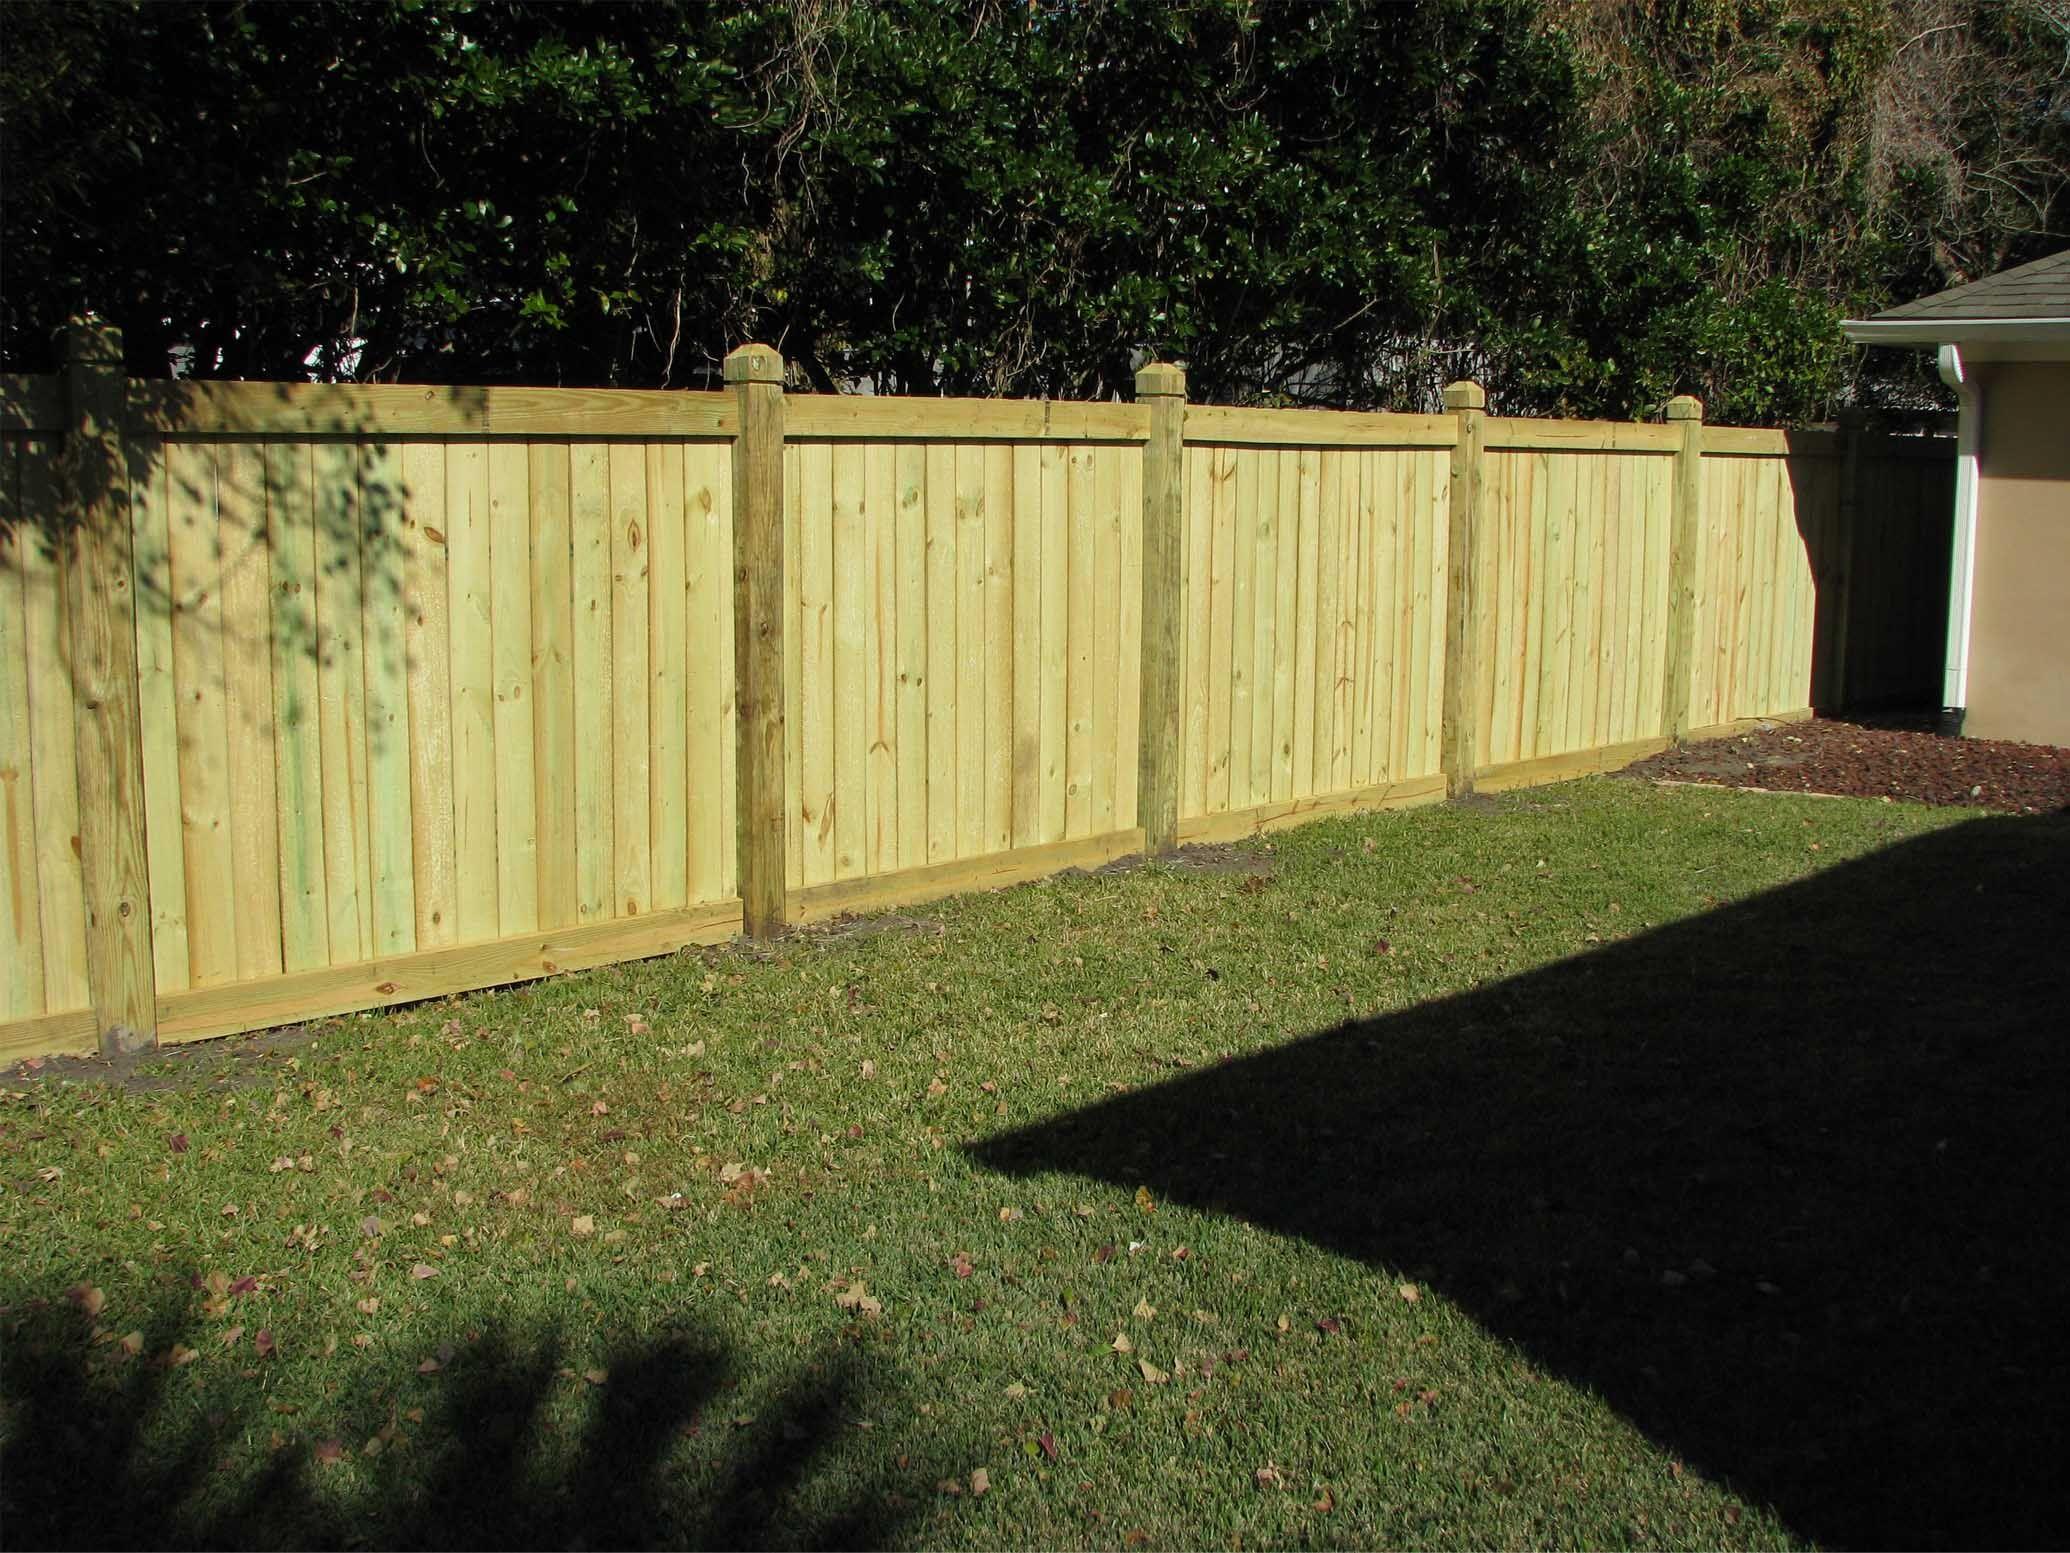 Good Neighbor Fence Plans - Google Search